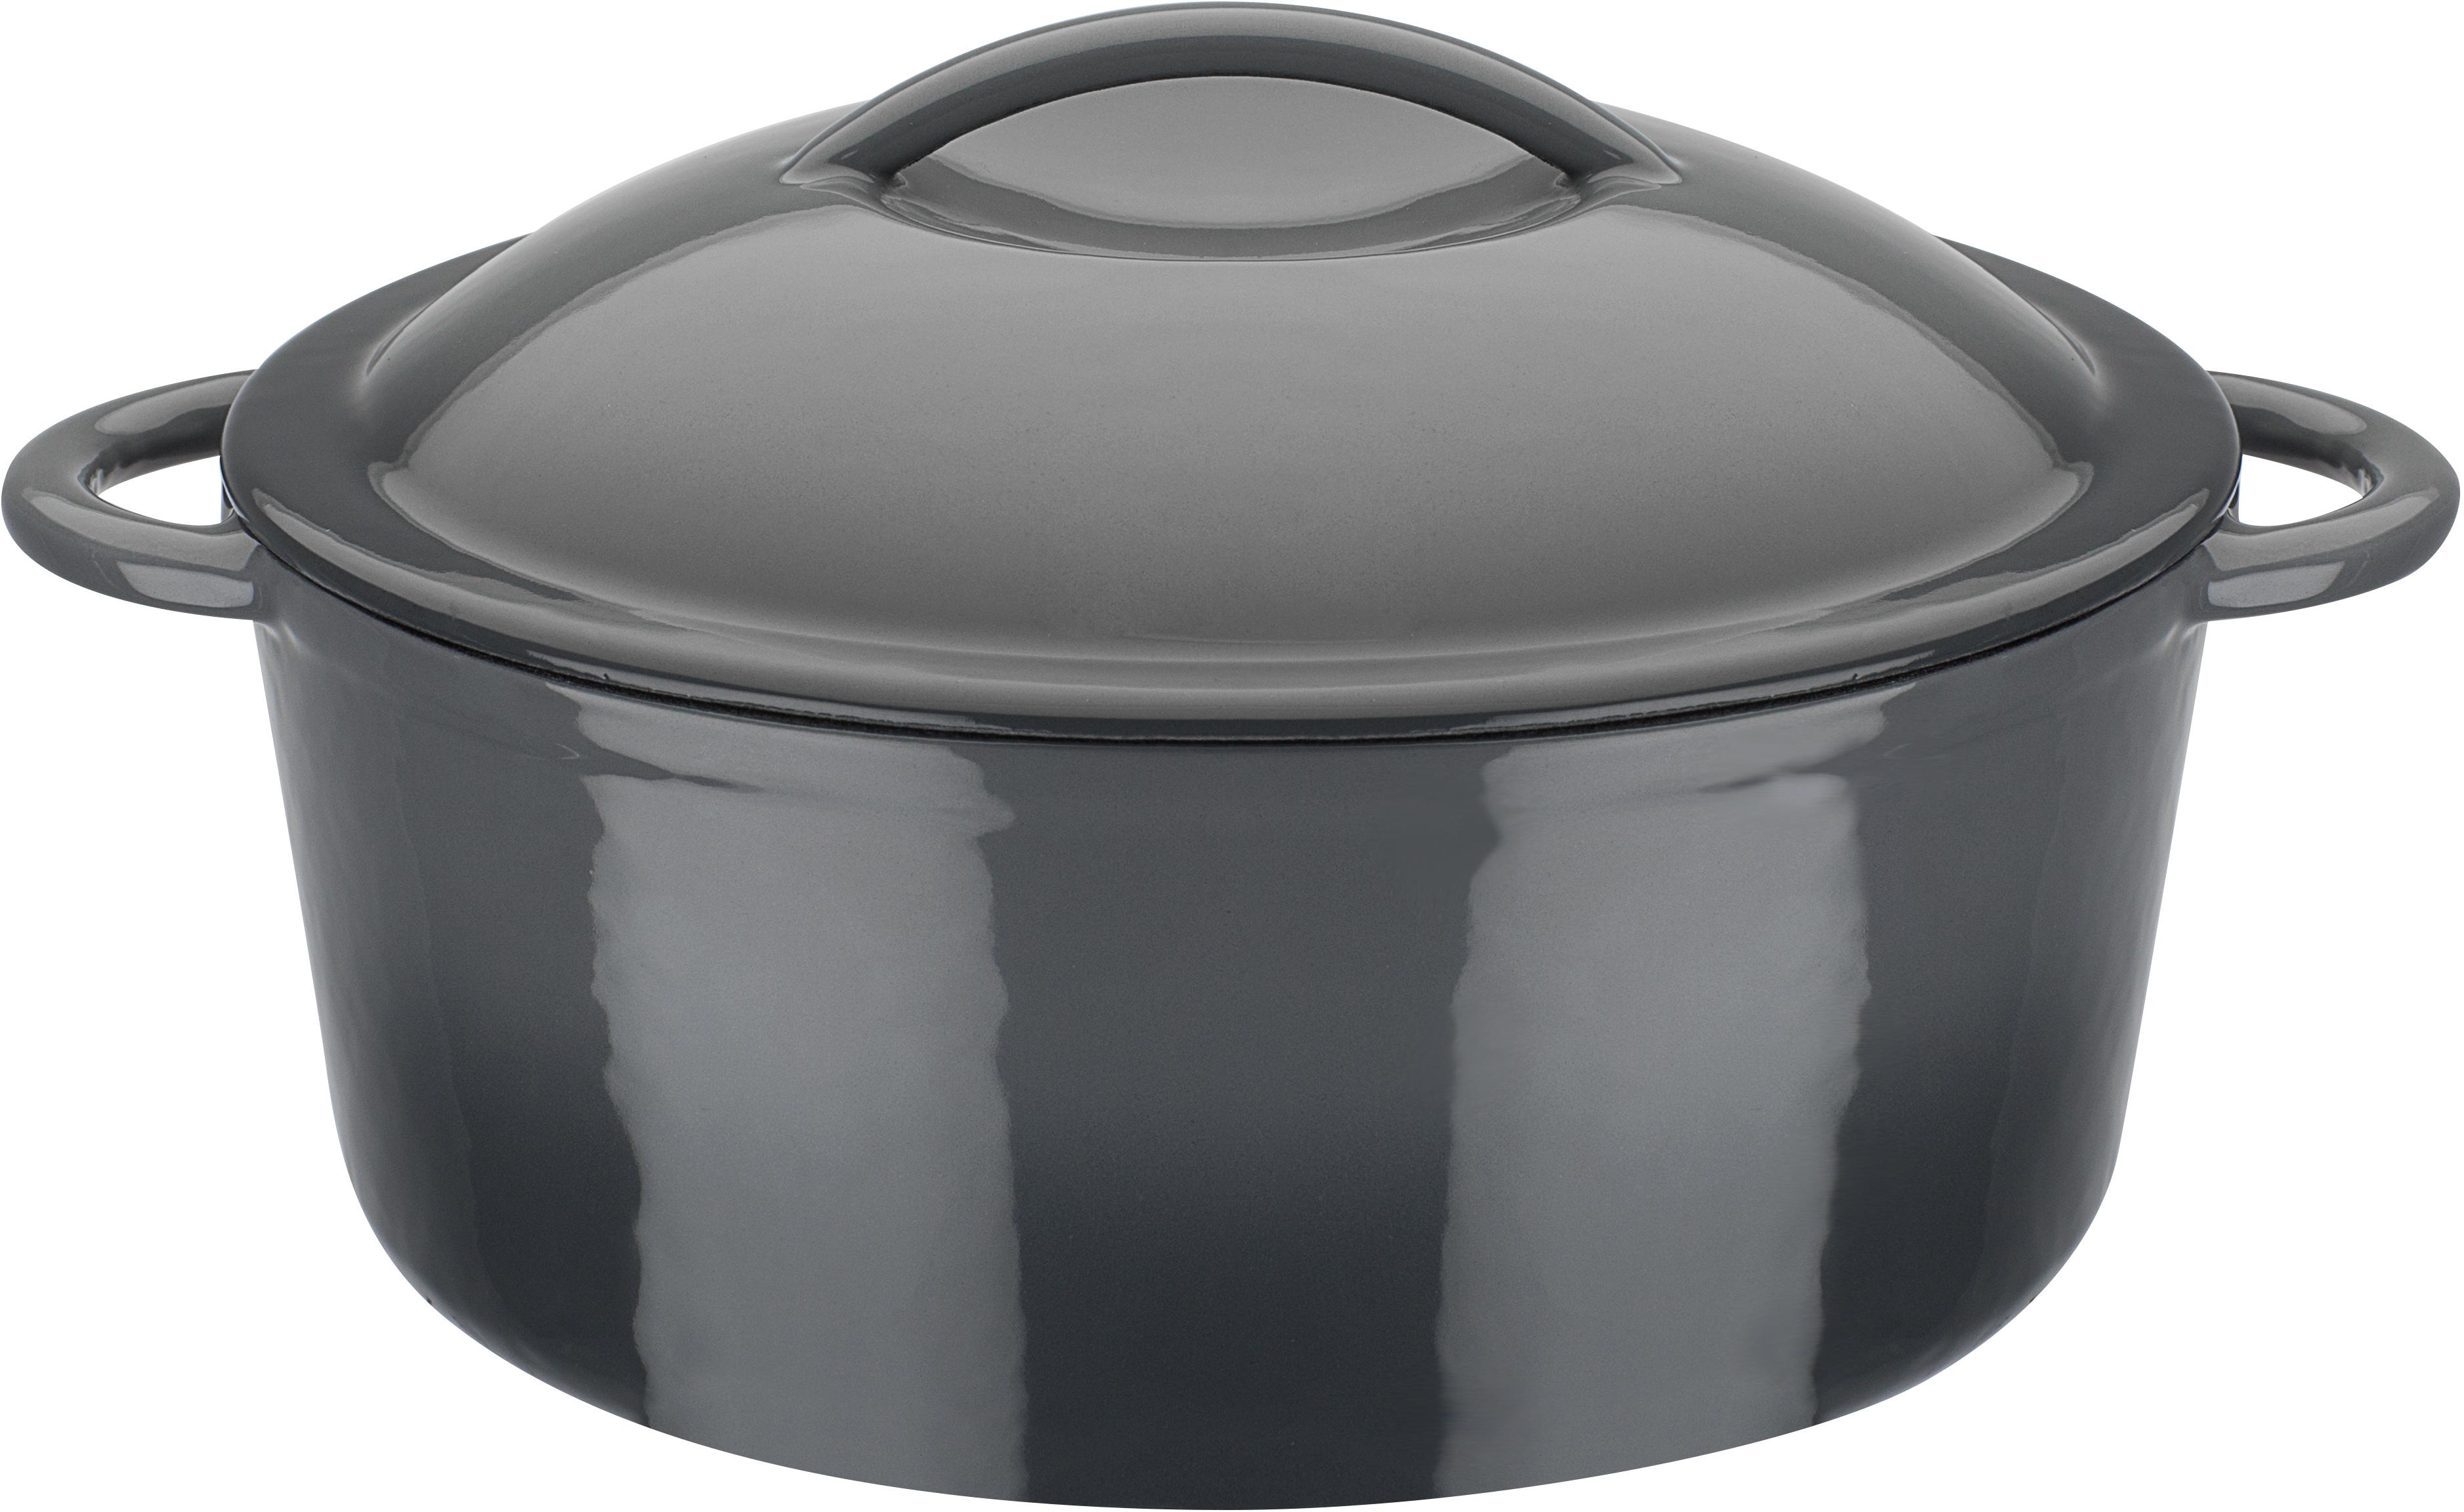 GSW Kochtopf grey, Gusseisen, (1 tlg.), Induktion grau Gemüsetöpfe Töpfe Haushaltswaren